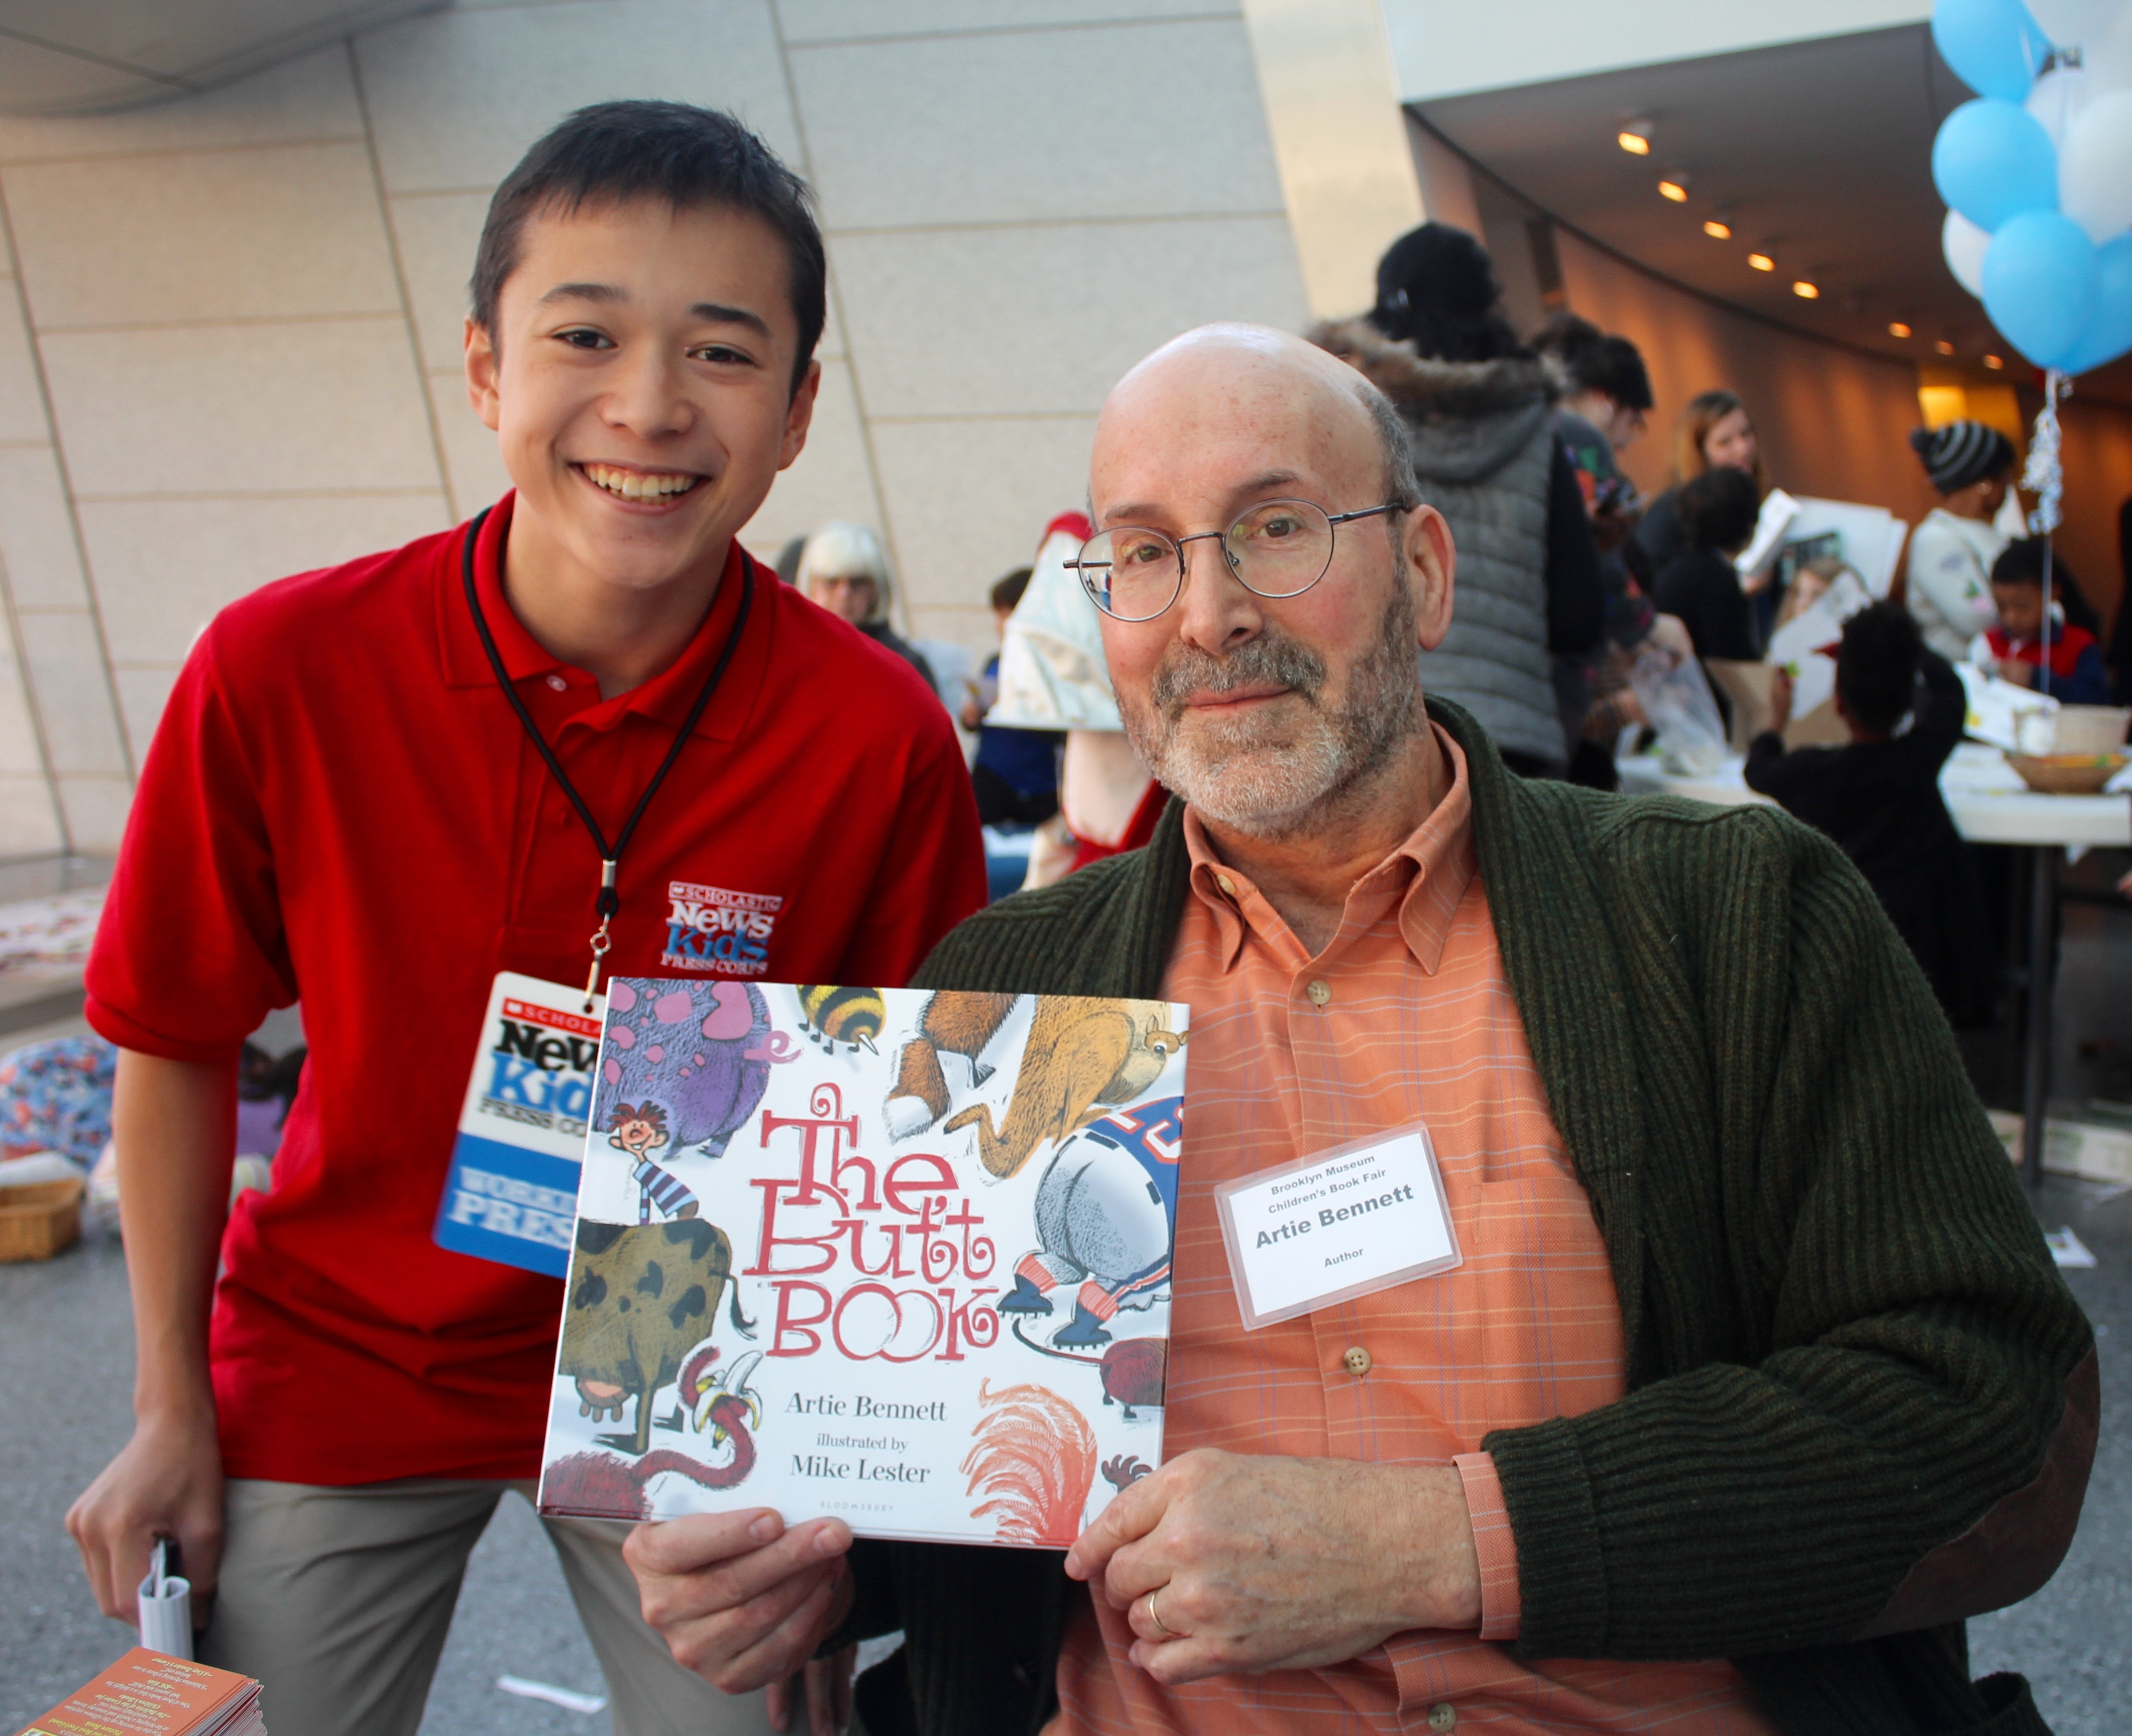 Max and Artie Bennett at the Brooklyn Children's Book Fair